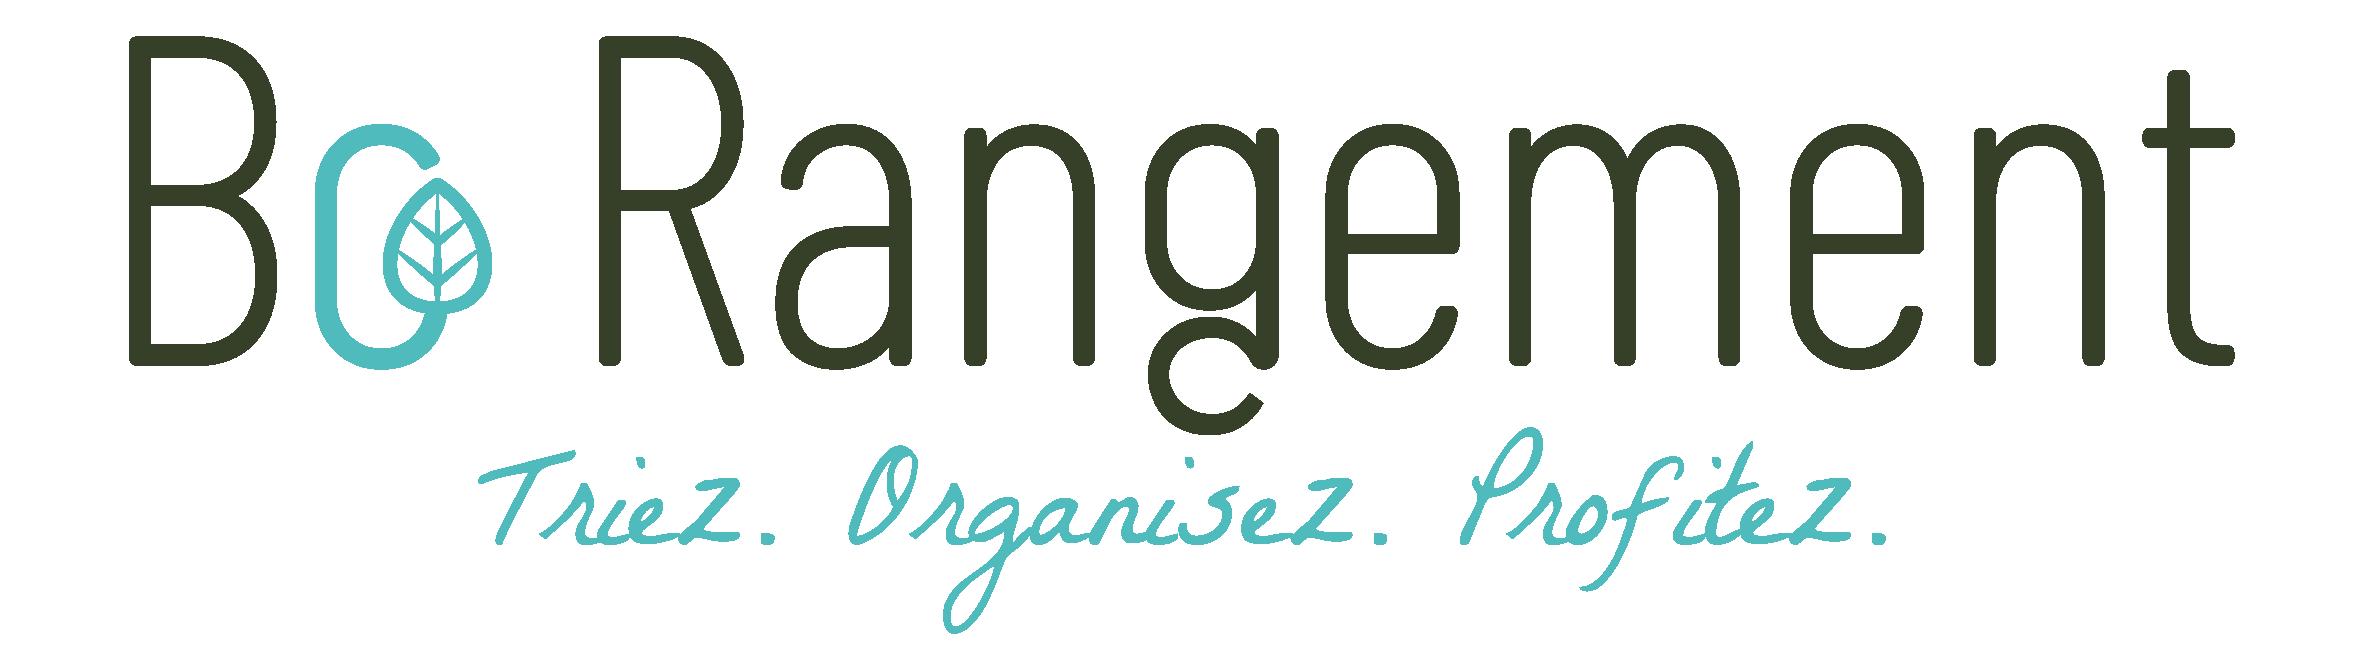 Logo Borangement Sansfondblanc